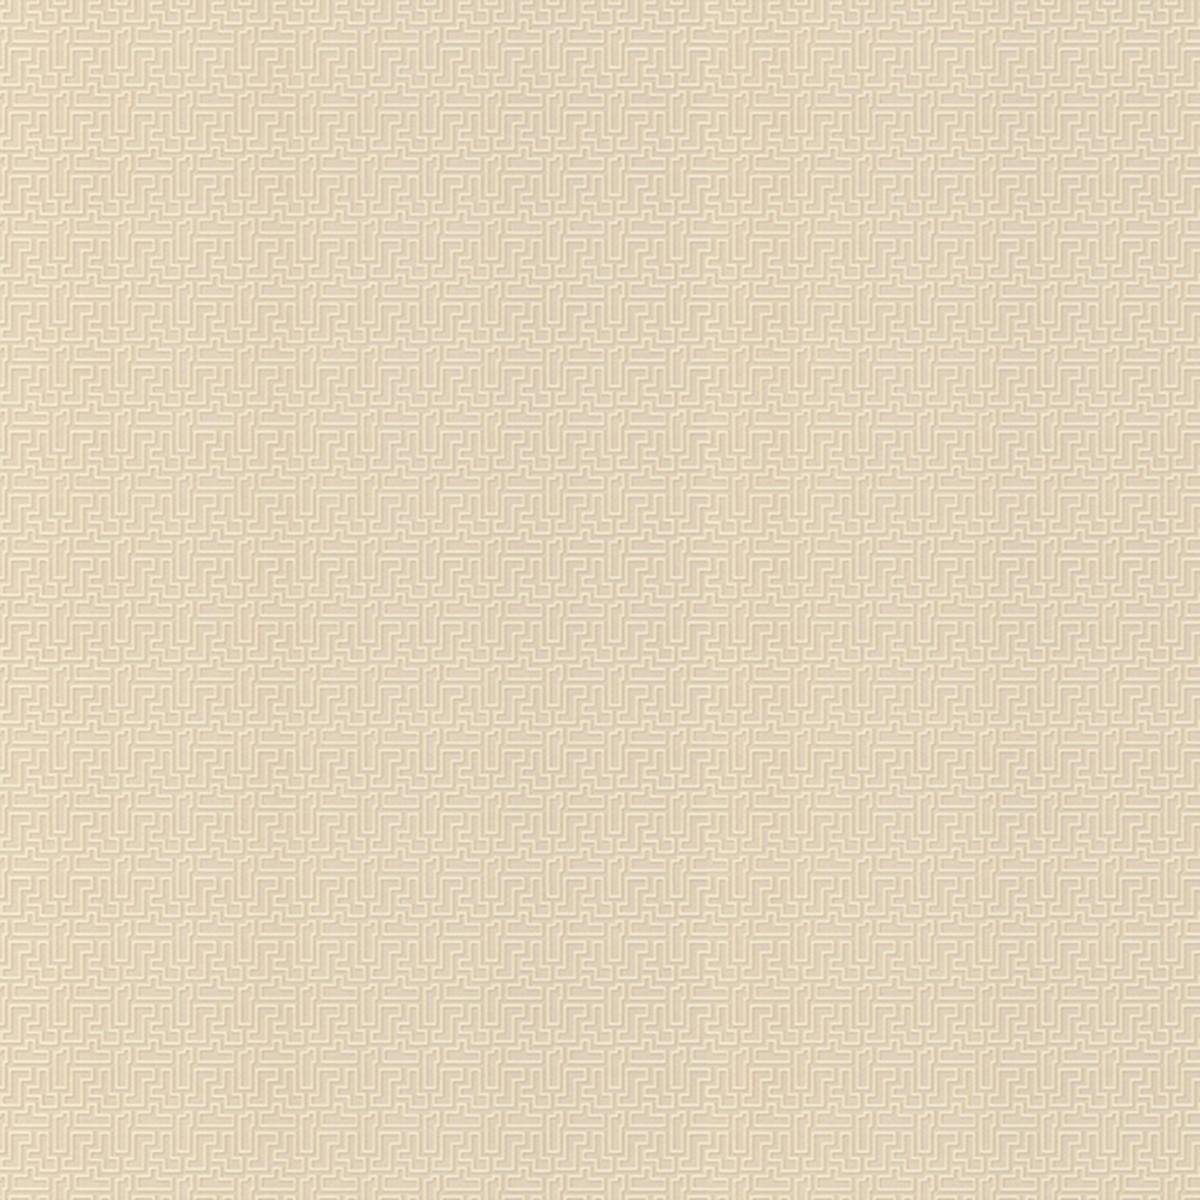 Обои флизелиновые Мир Авангард бежевые 1.06 м 45-188-08